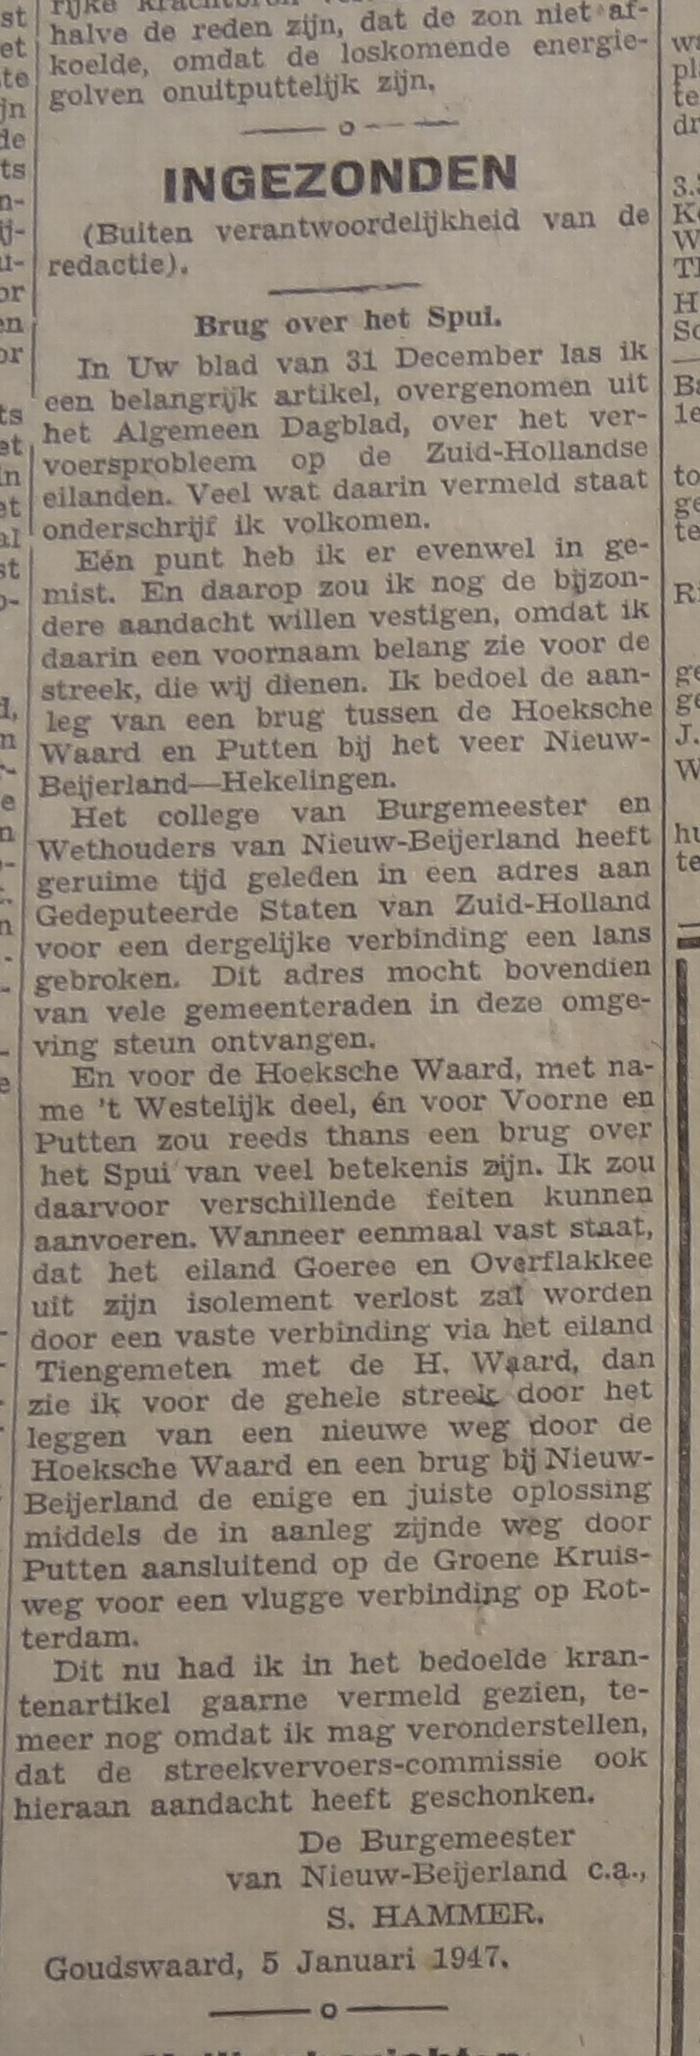 brug-over-het-spui-hammer-januari1947